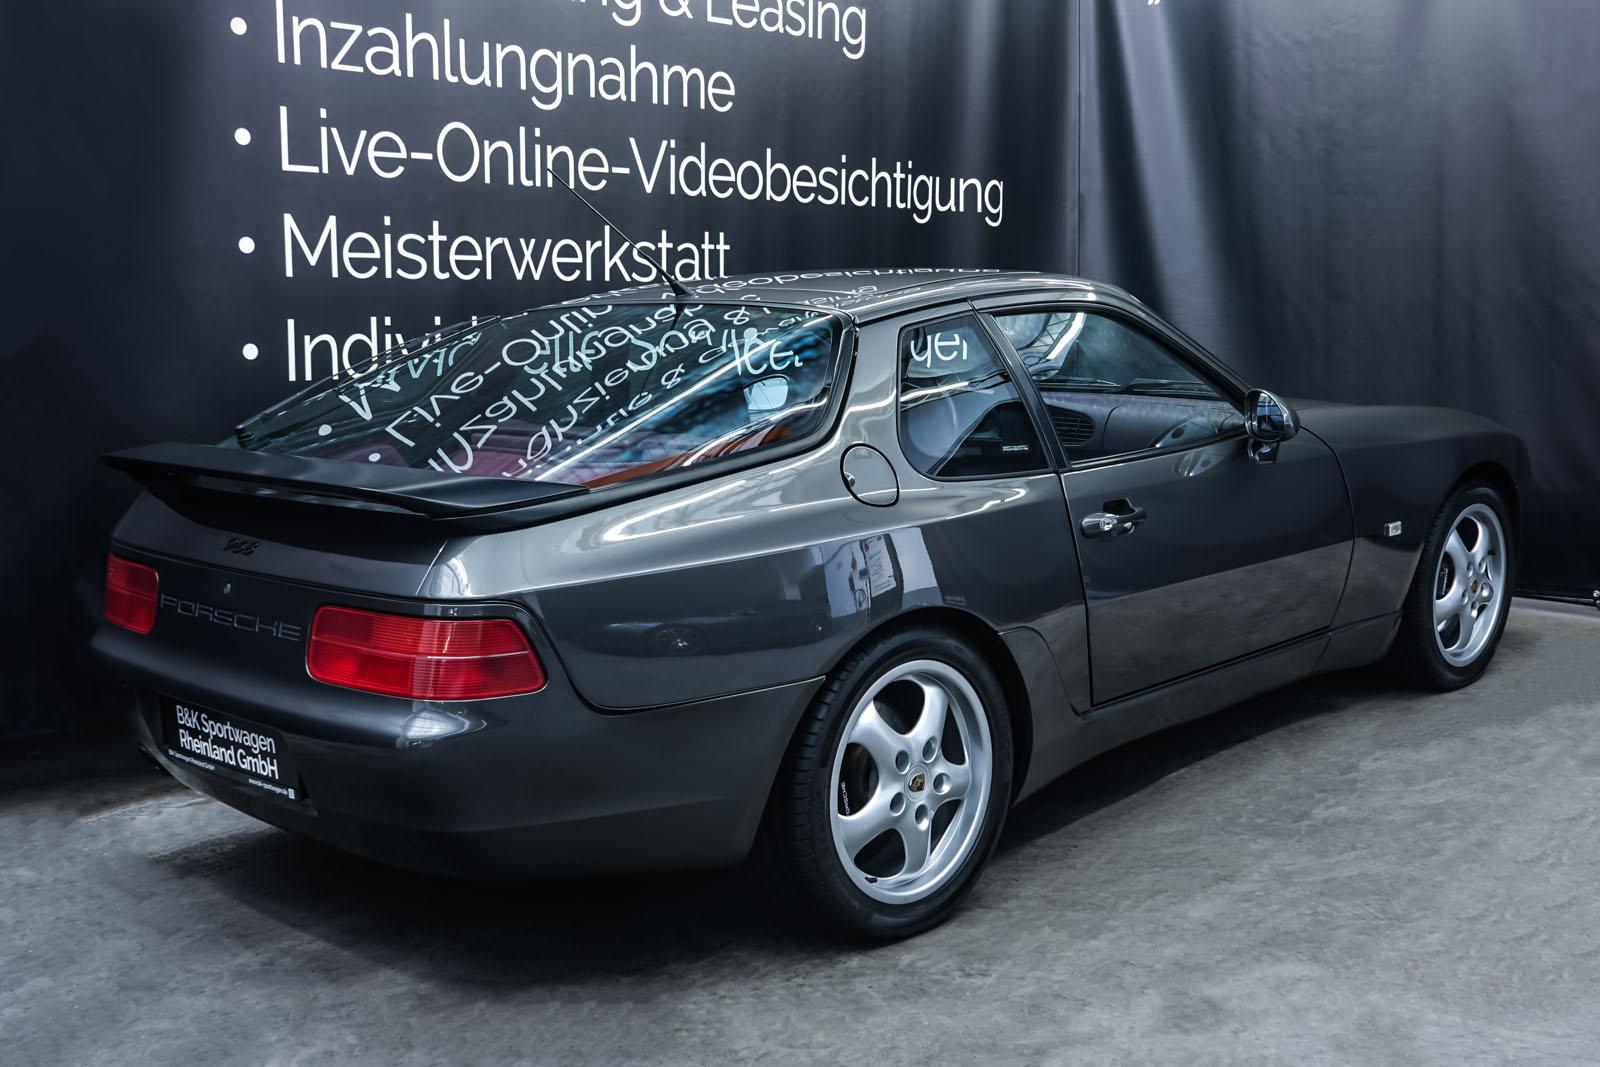 Porsche_986_Targa_Grau_Pink_POR-1092_13_w